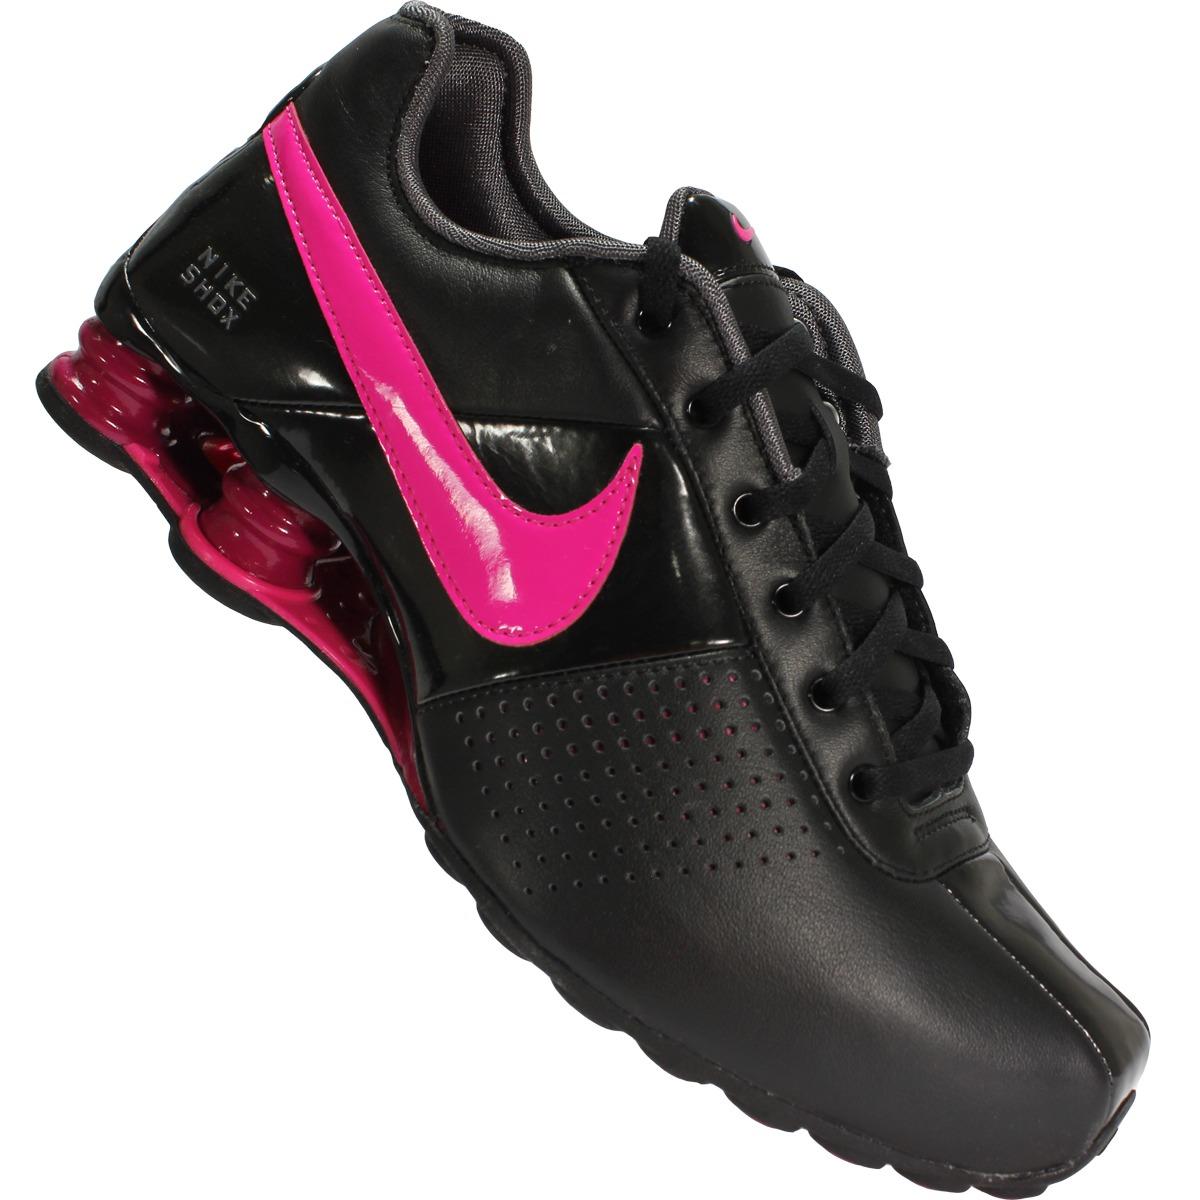 Nike shoes 2013